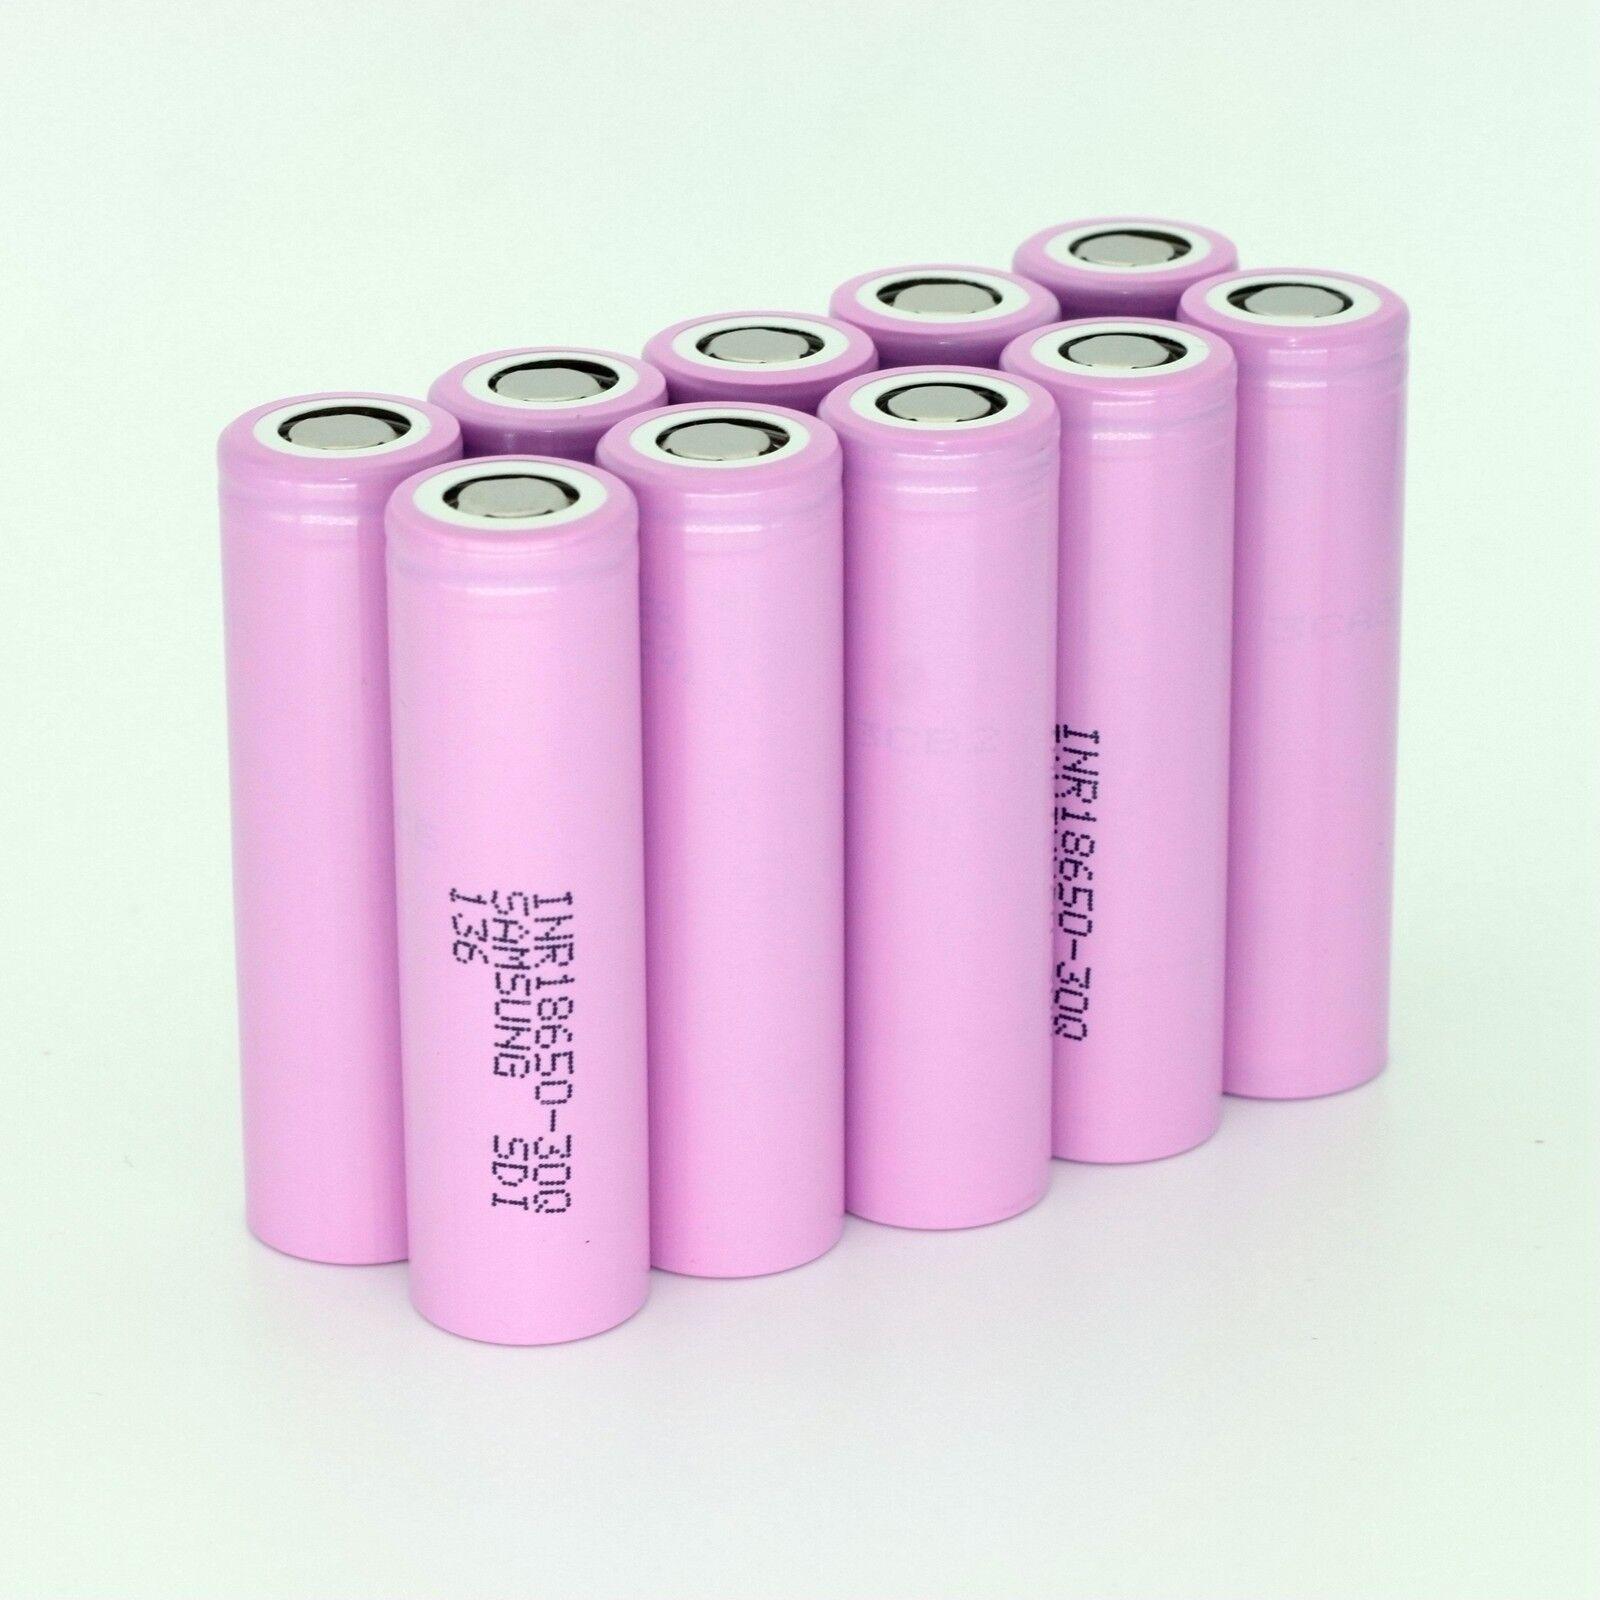 10pcs SAMSUNG 30Q INR 18650 3000mAh/15A High Drain Flat Top Rechargeable Battery